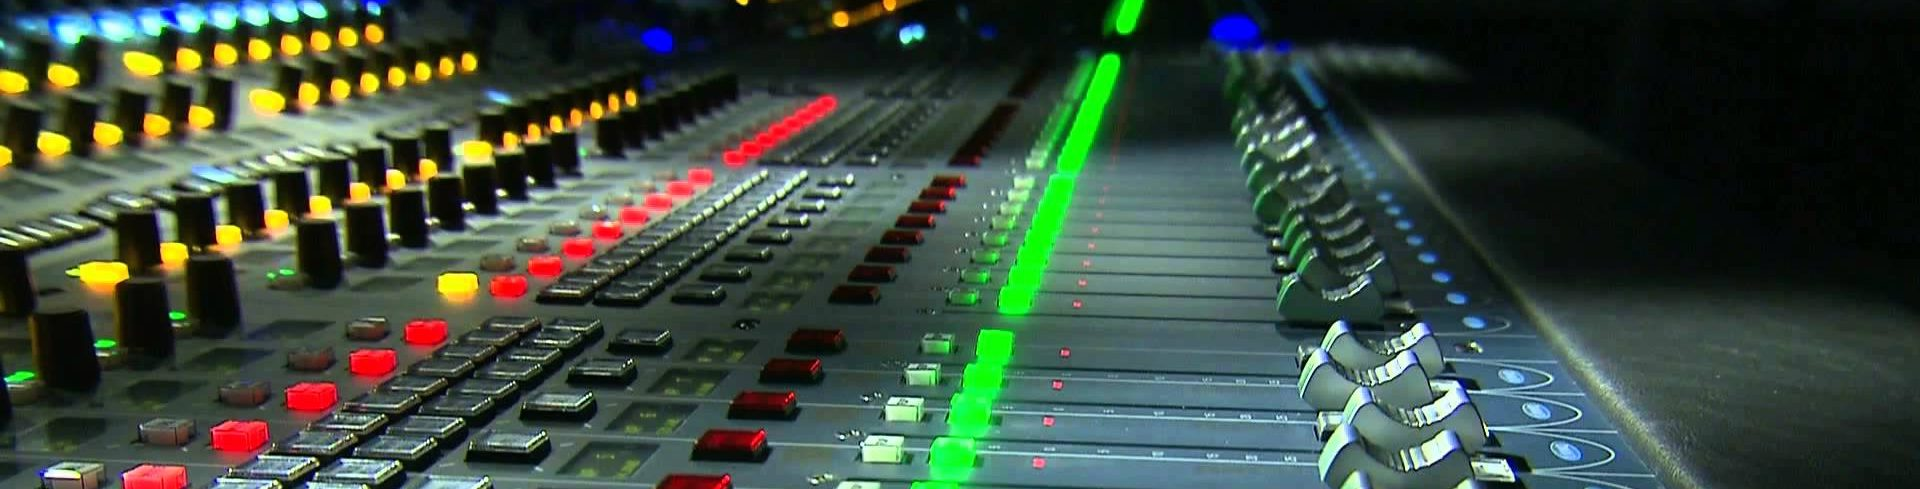 DJ Ricar Sound Service